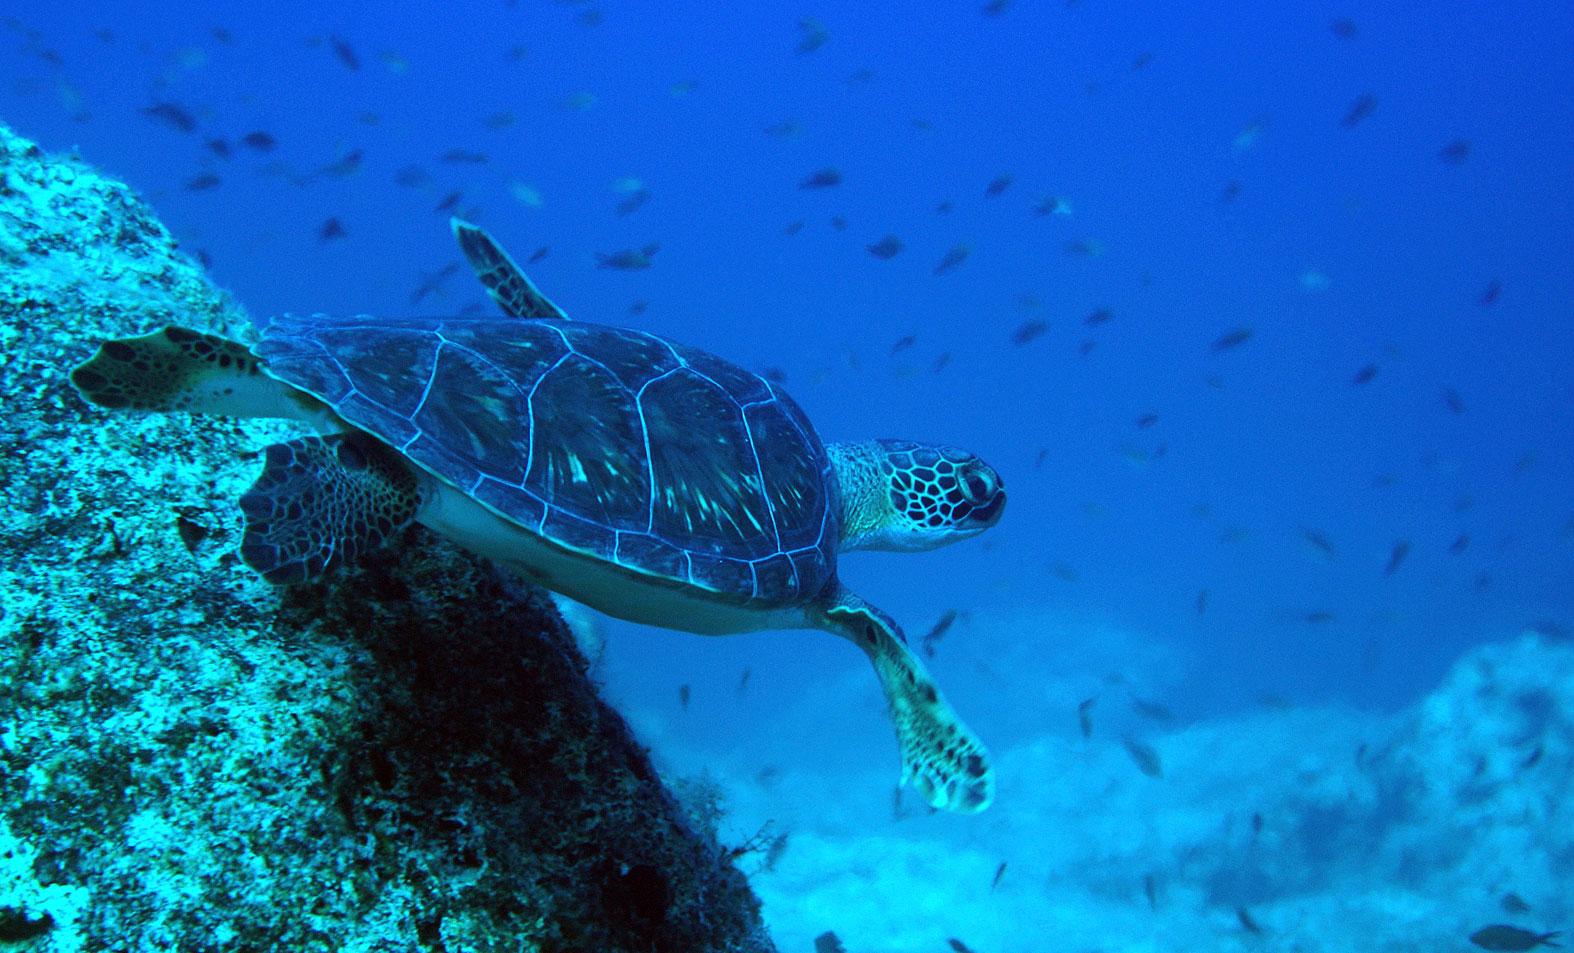 kyrenia-banner-turtle.jpg